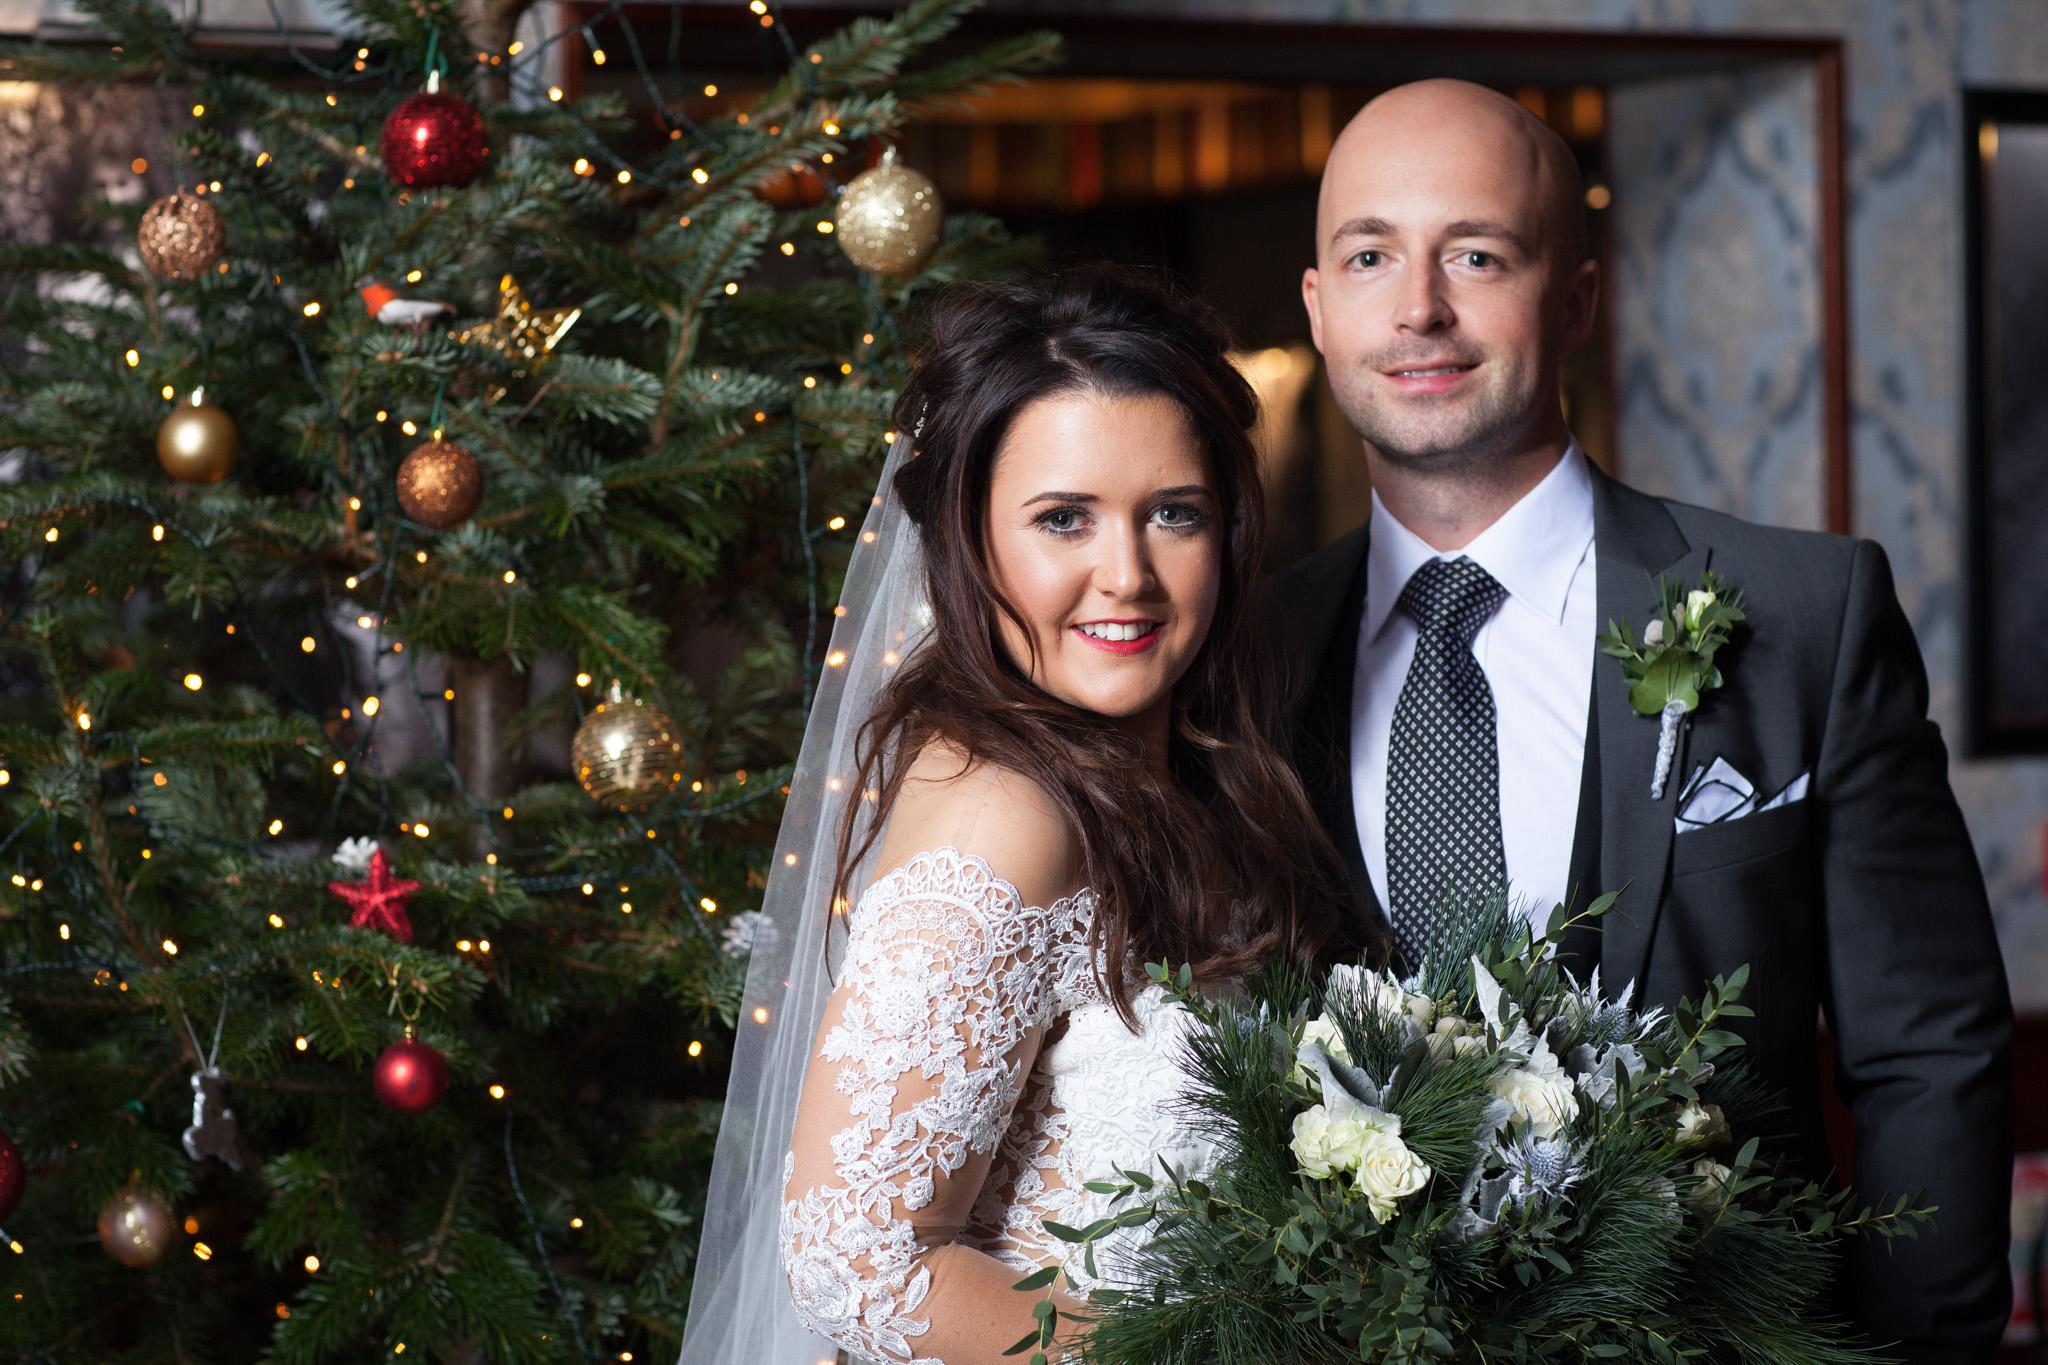 Mark_Barnes_Northern_Ireland_wedding_photographer_Harveys_Point_Donegall_Wedding_photography-Adam&Gemma-42.jpg